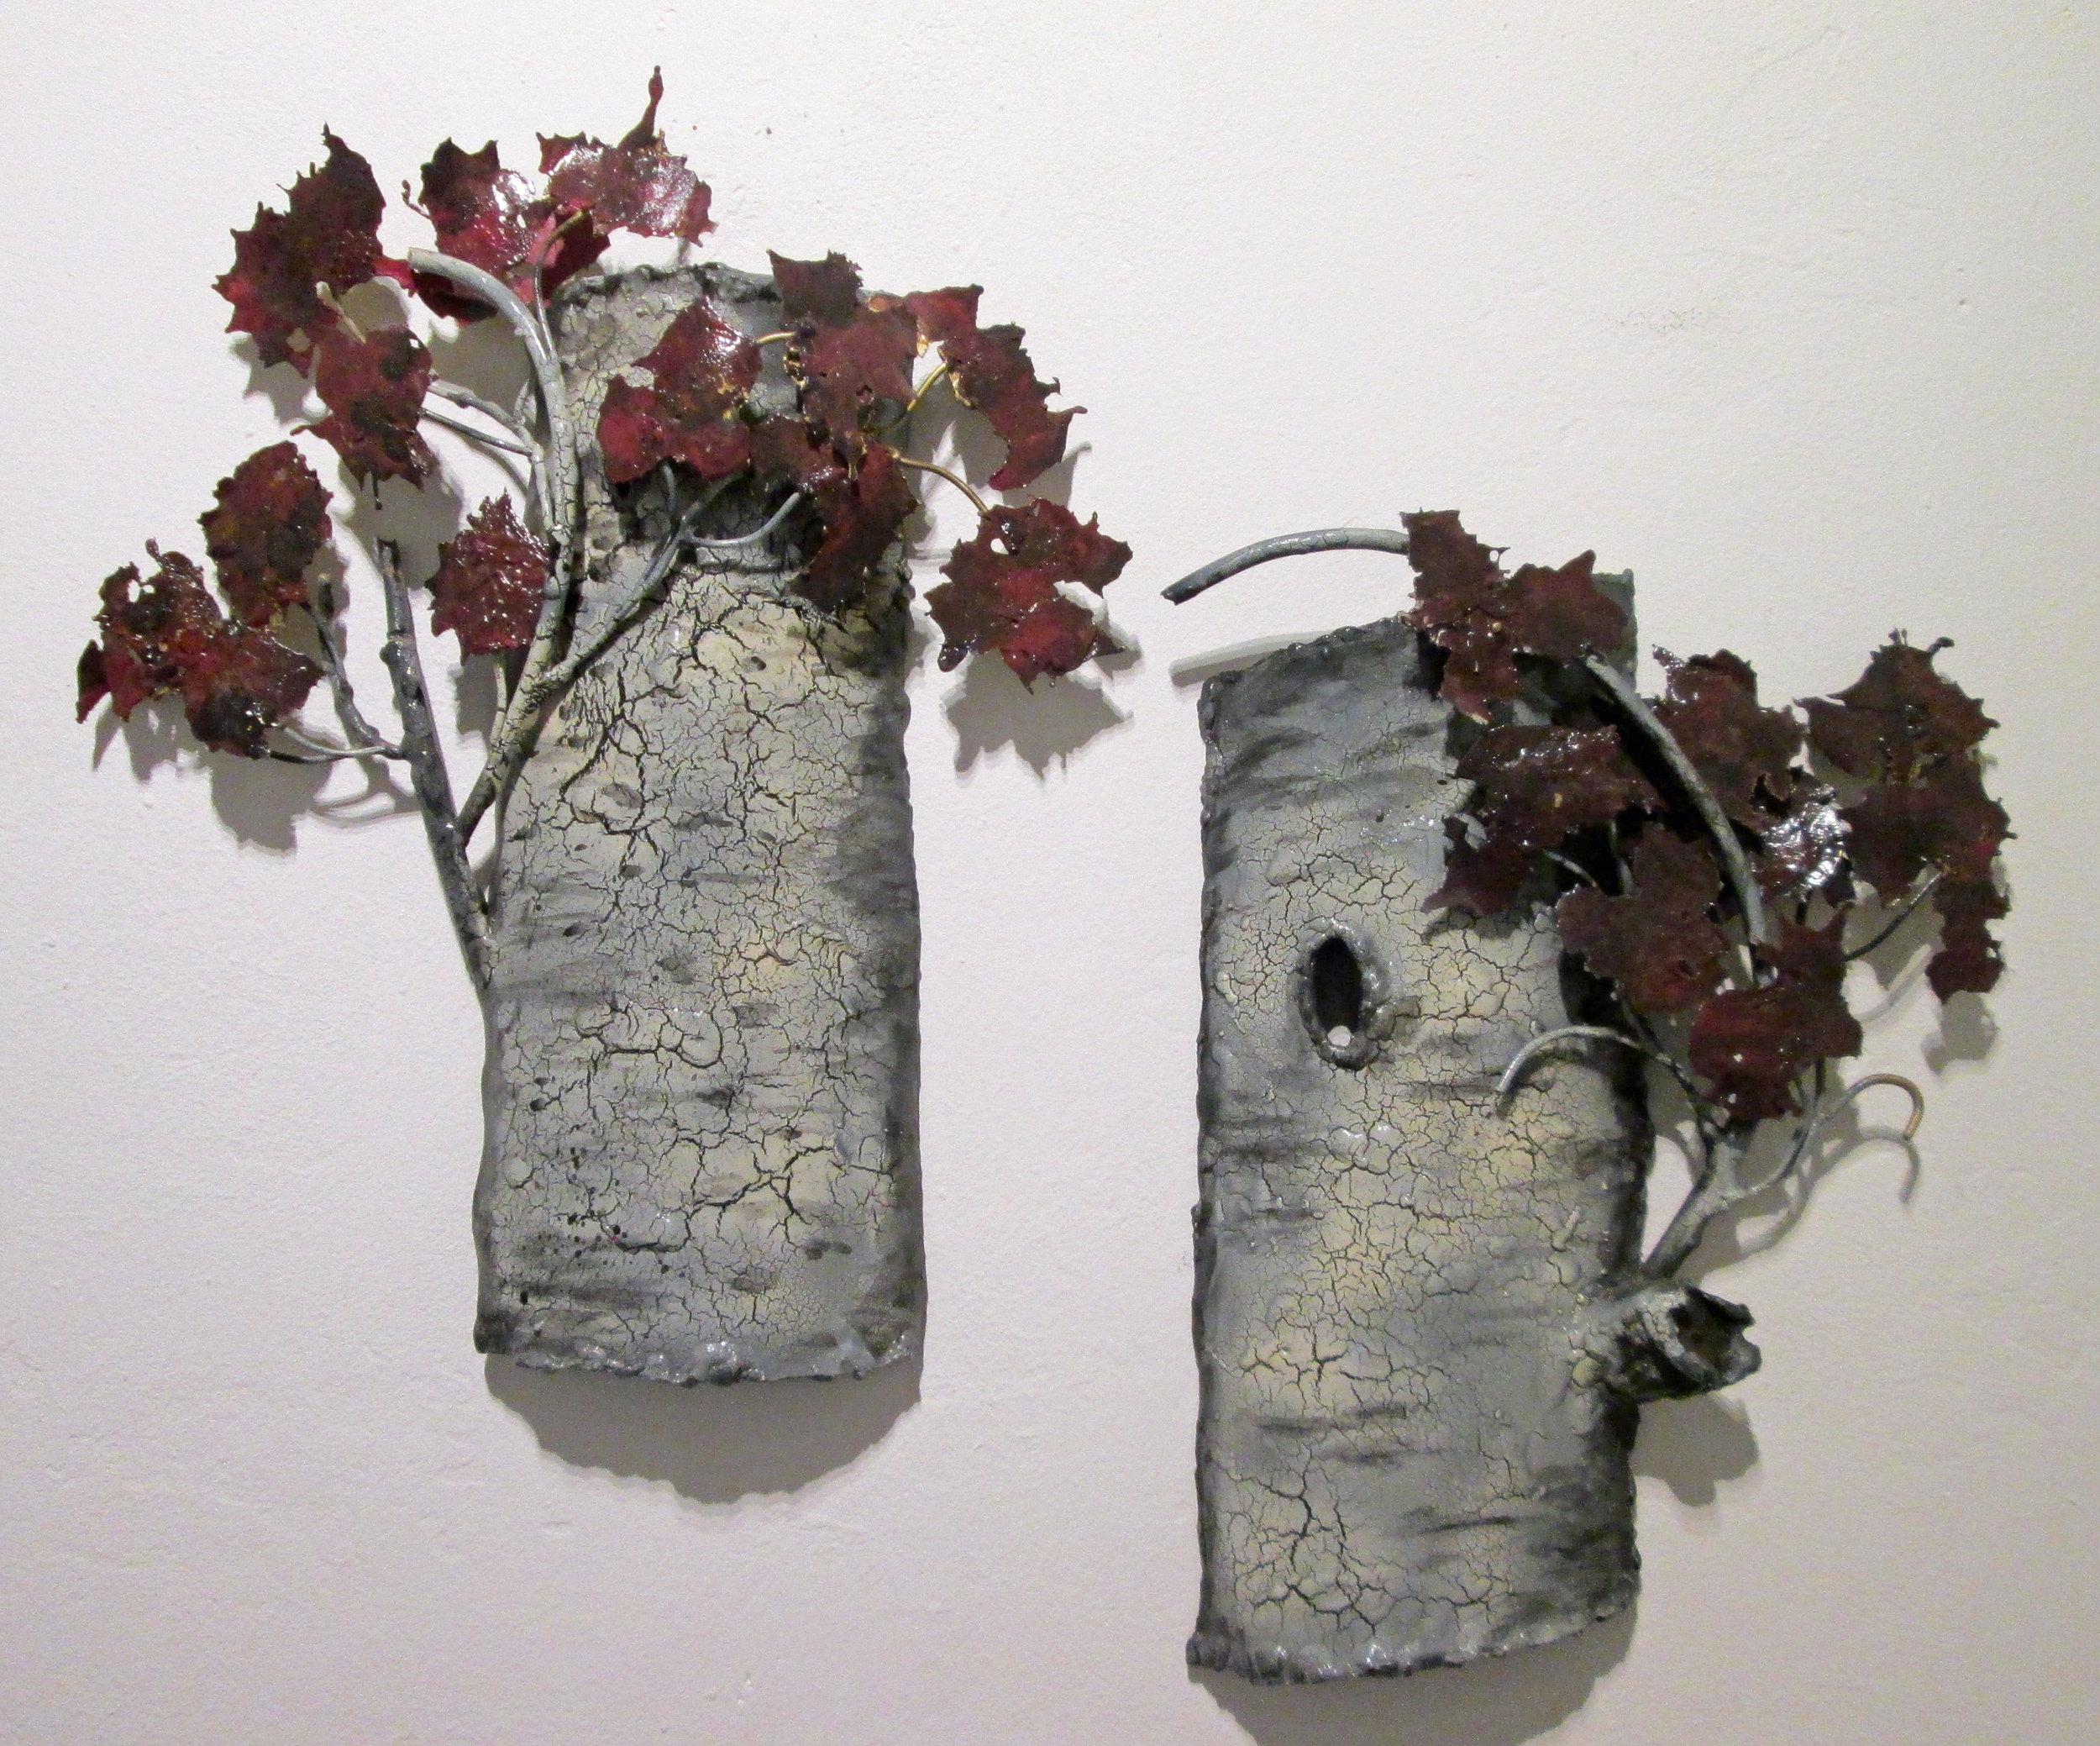 Mini Aspen Fragments